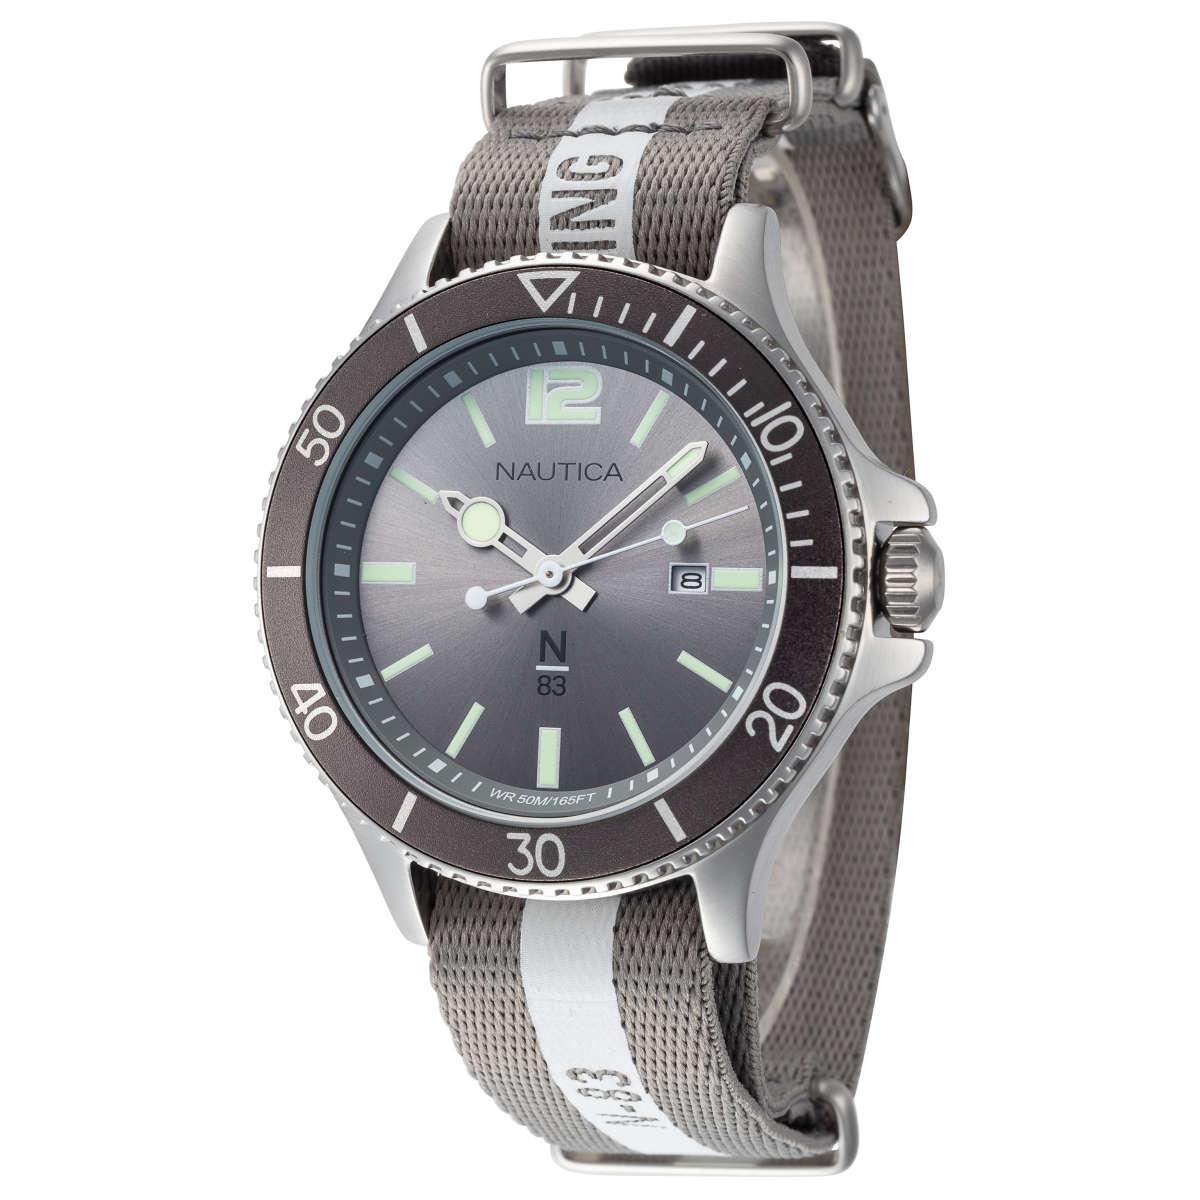 Nautica Cocoa Beach N83 43mm Nylon Strap Men's Watch